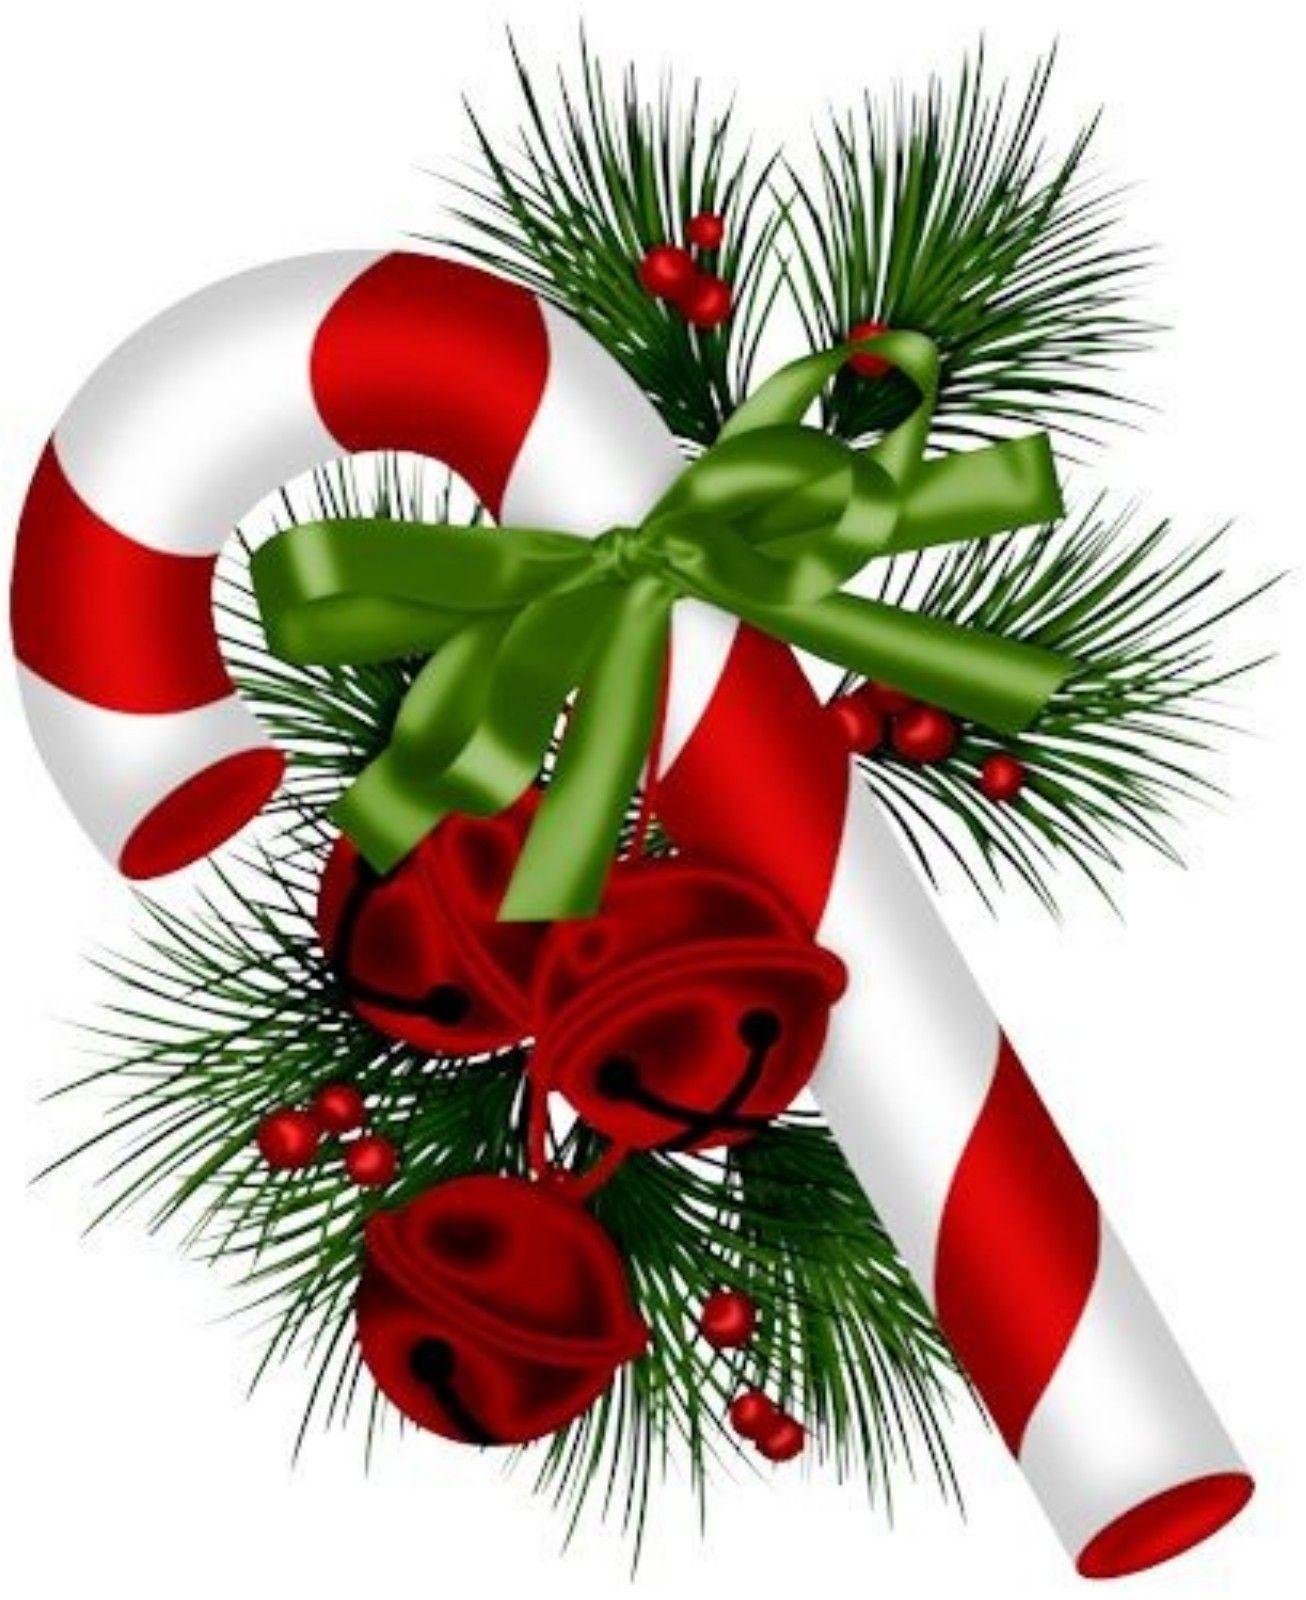 Pin By Queen Elizabeth On Vintage Christmas Snowmen And Winter Wonderland Scenery In 2020 Vintage Christmas Christmas Wreaths Merry Christmas